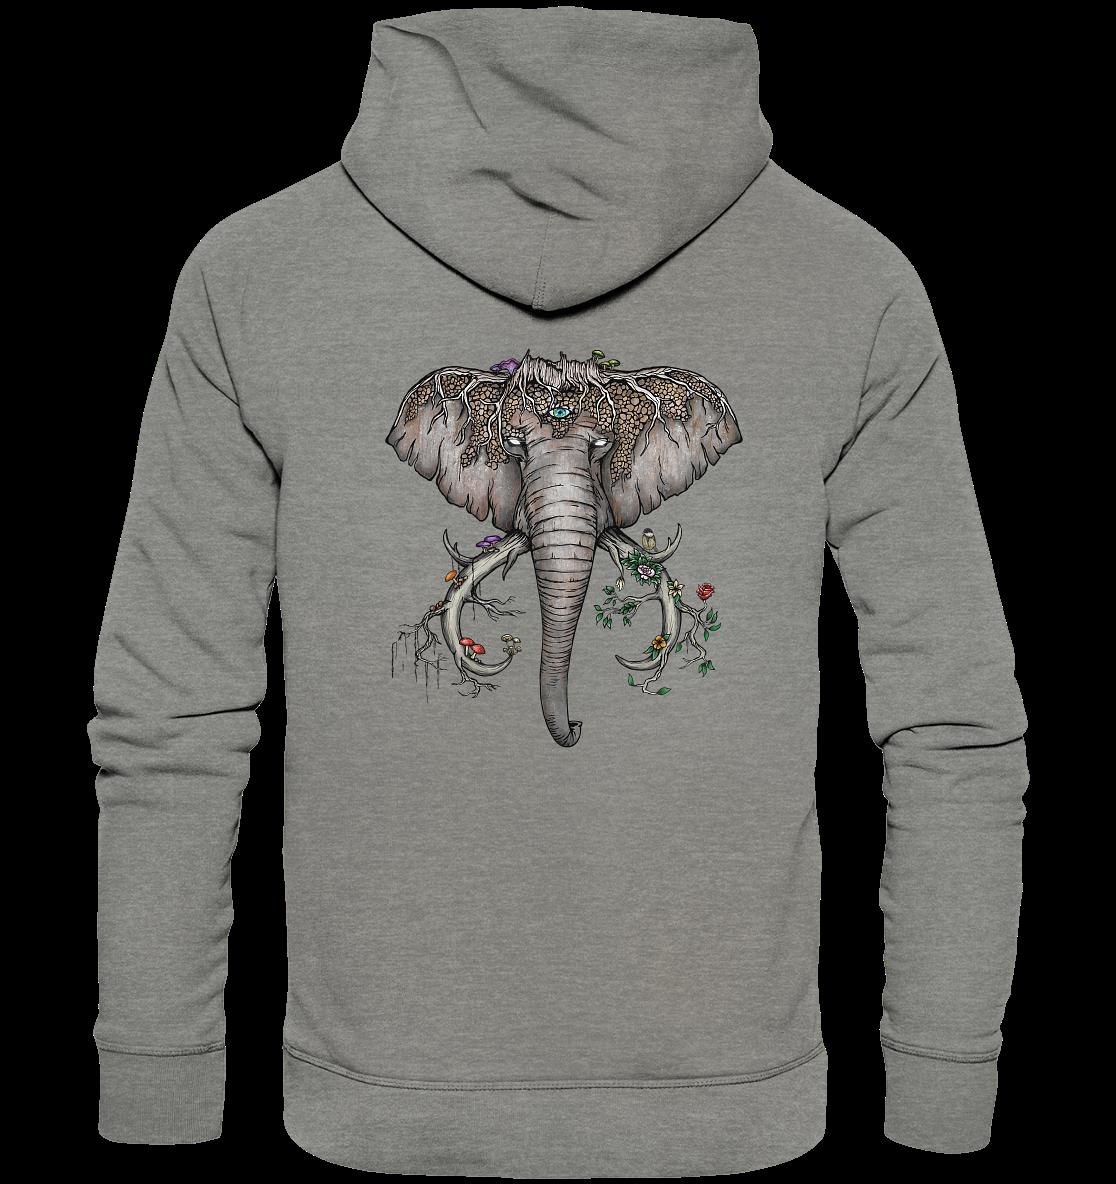 back-organic-hoodie-818381-1116x-1.png